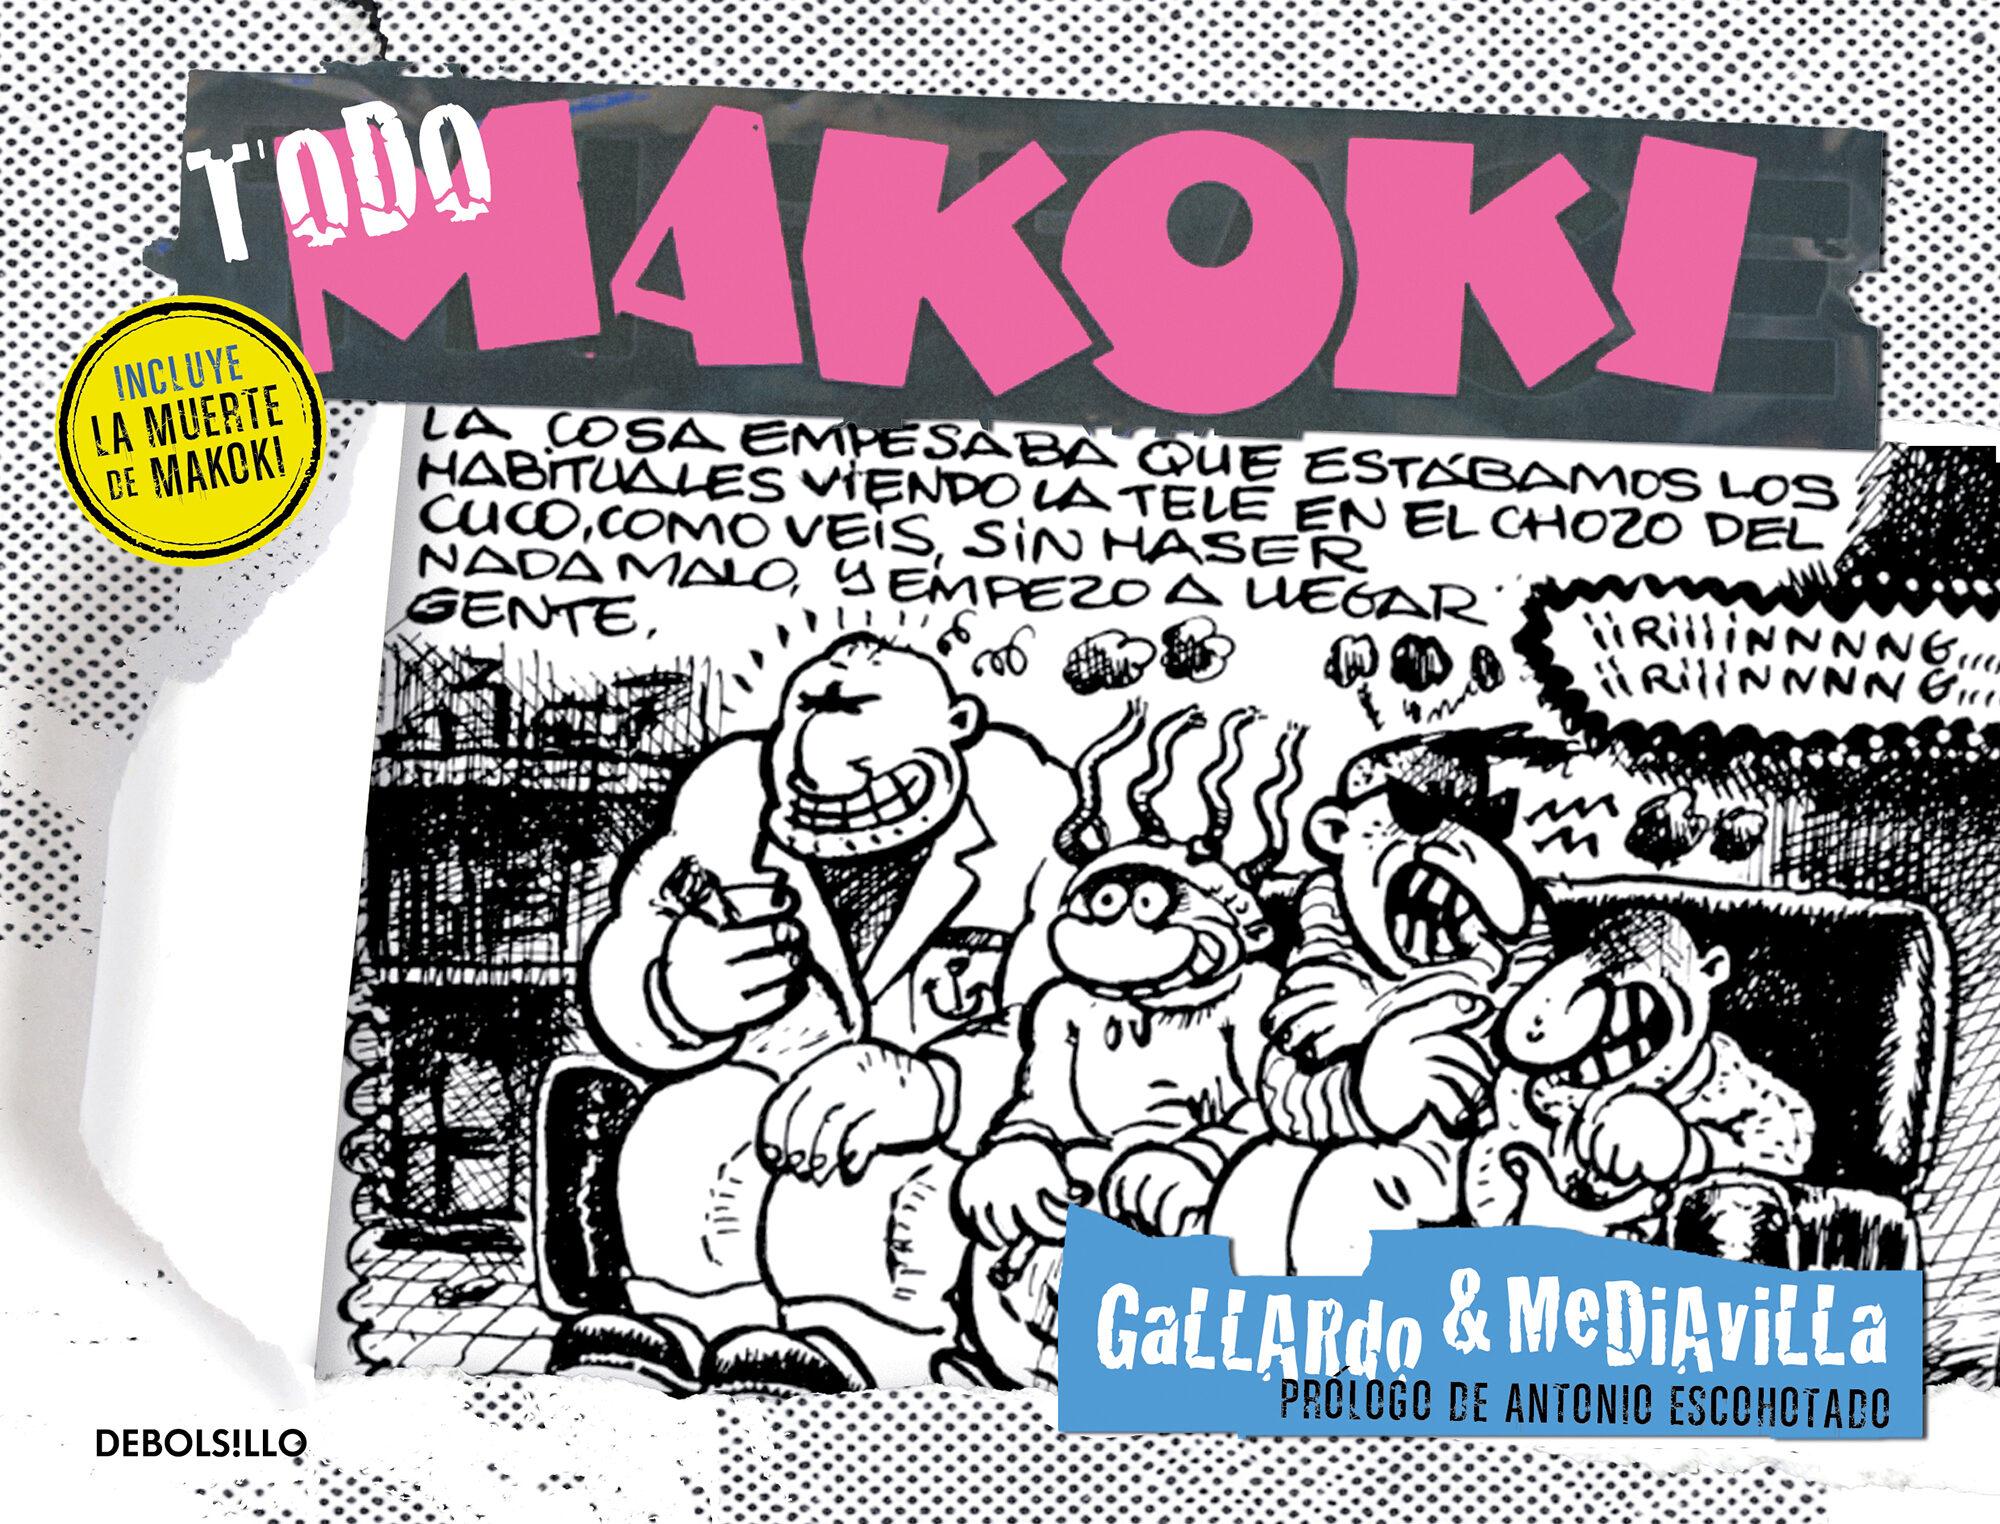 Resultado de imagen de makoki